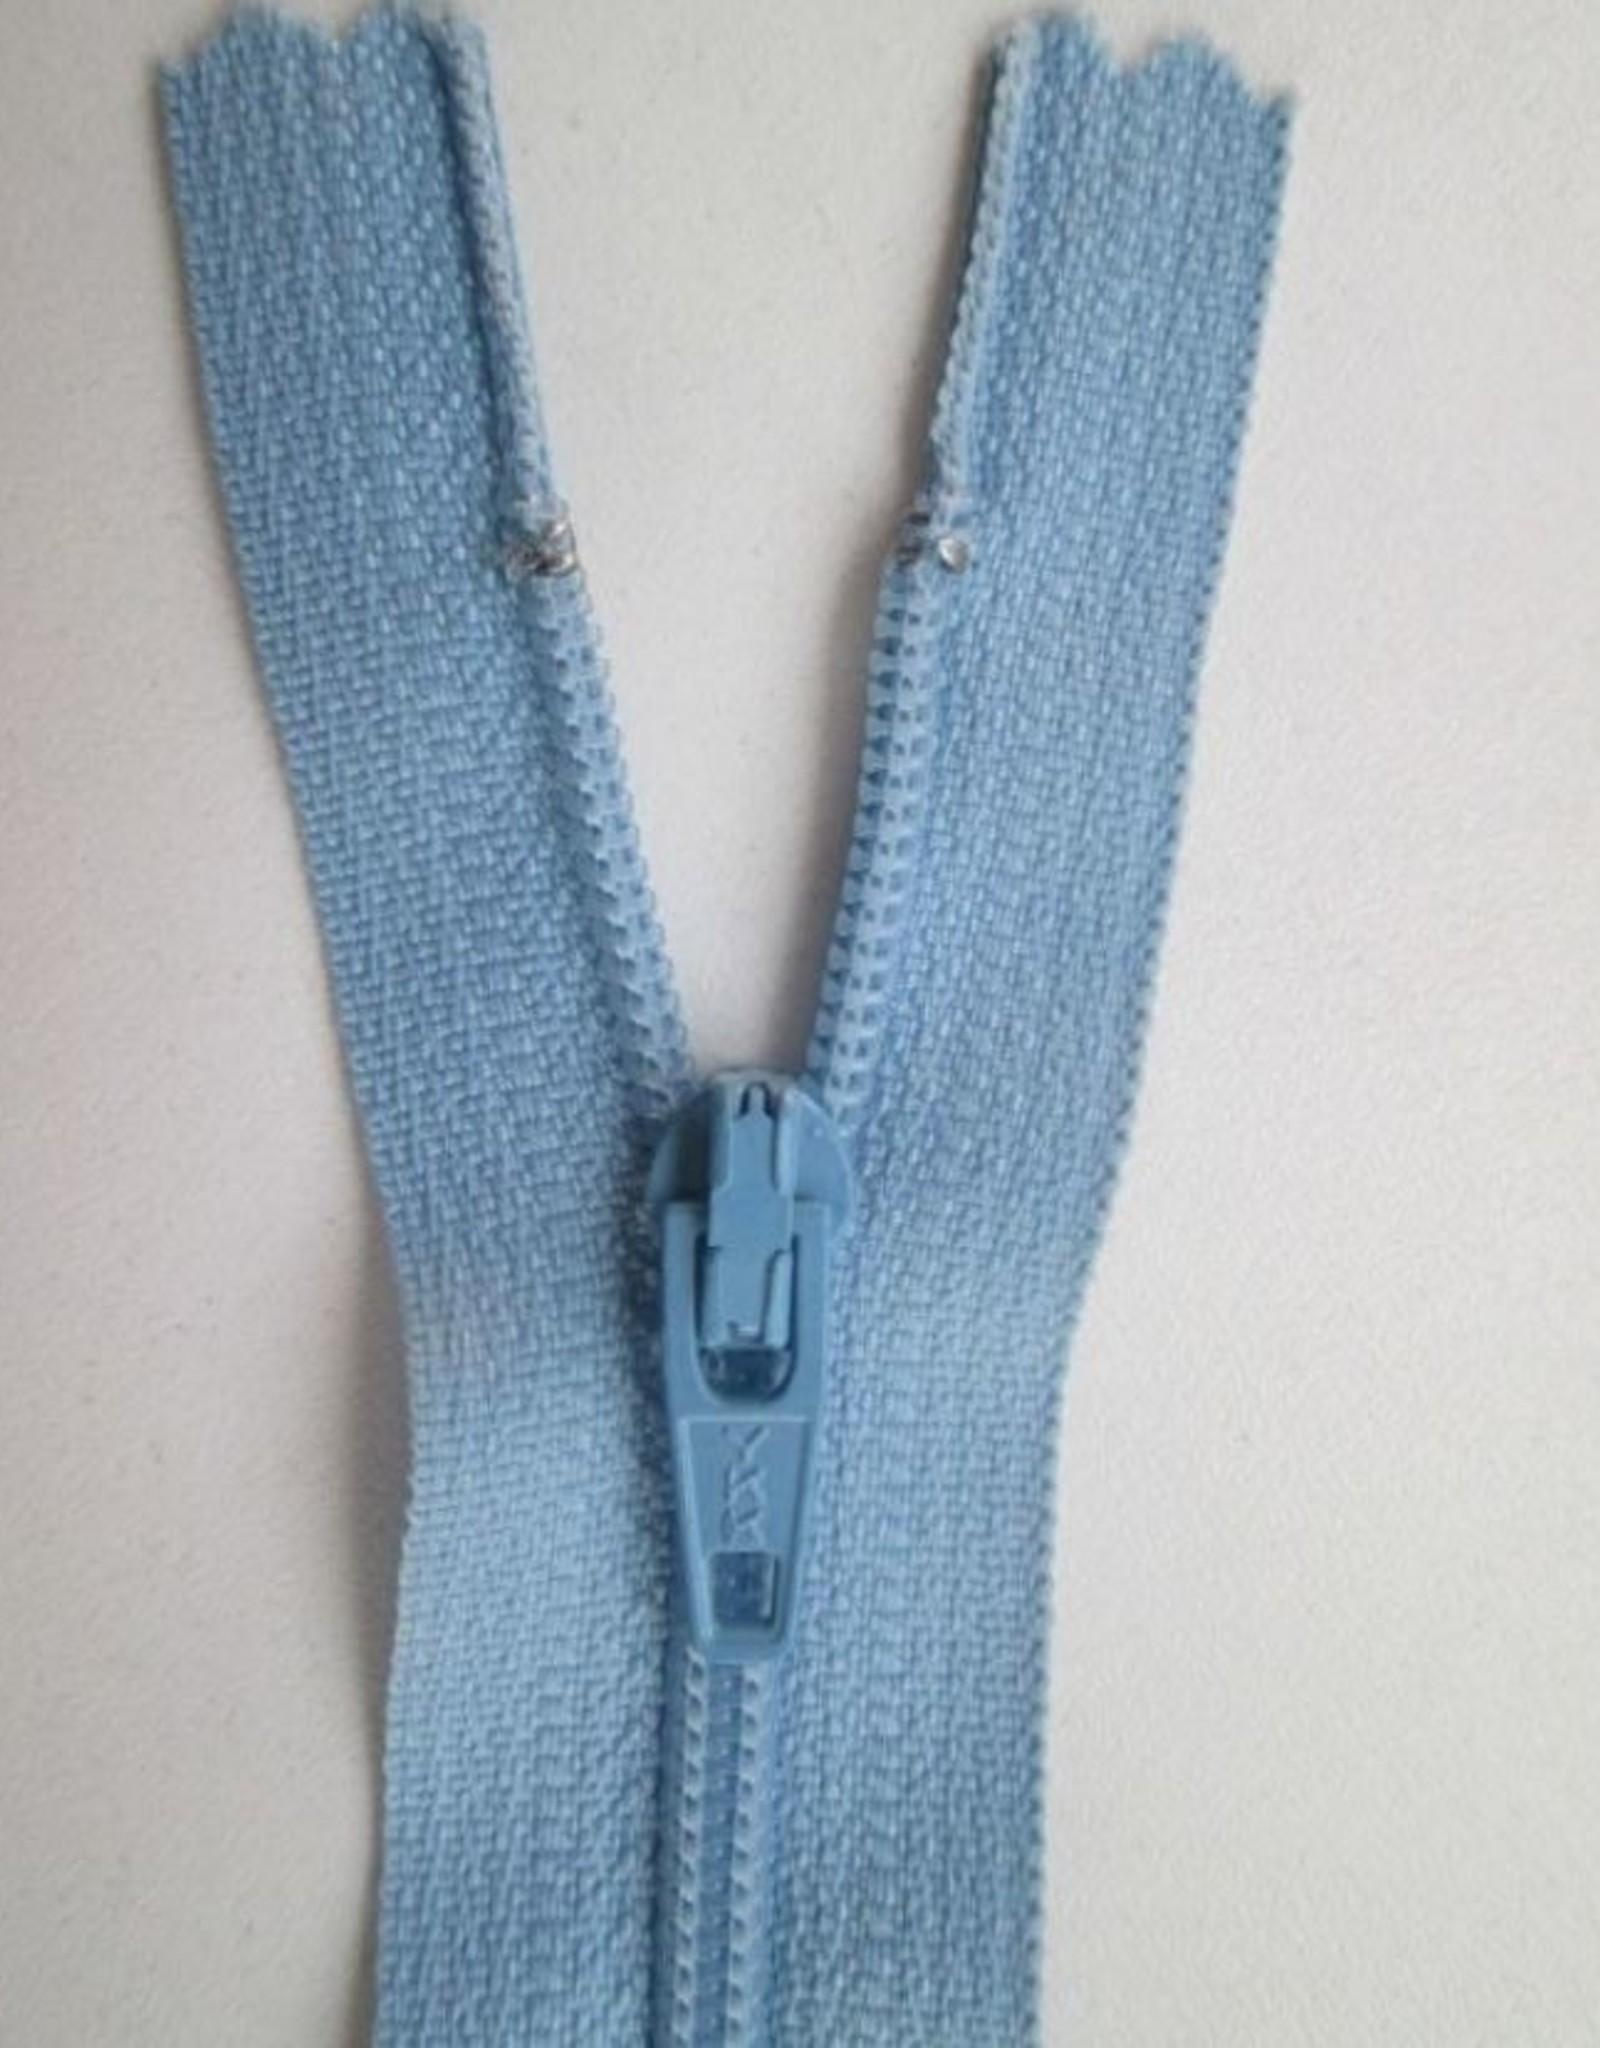 YKK Spiraalrits niet-DB 3mm midden blauw 546-12cm